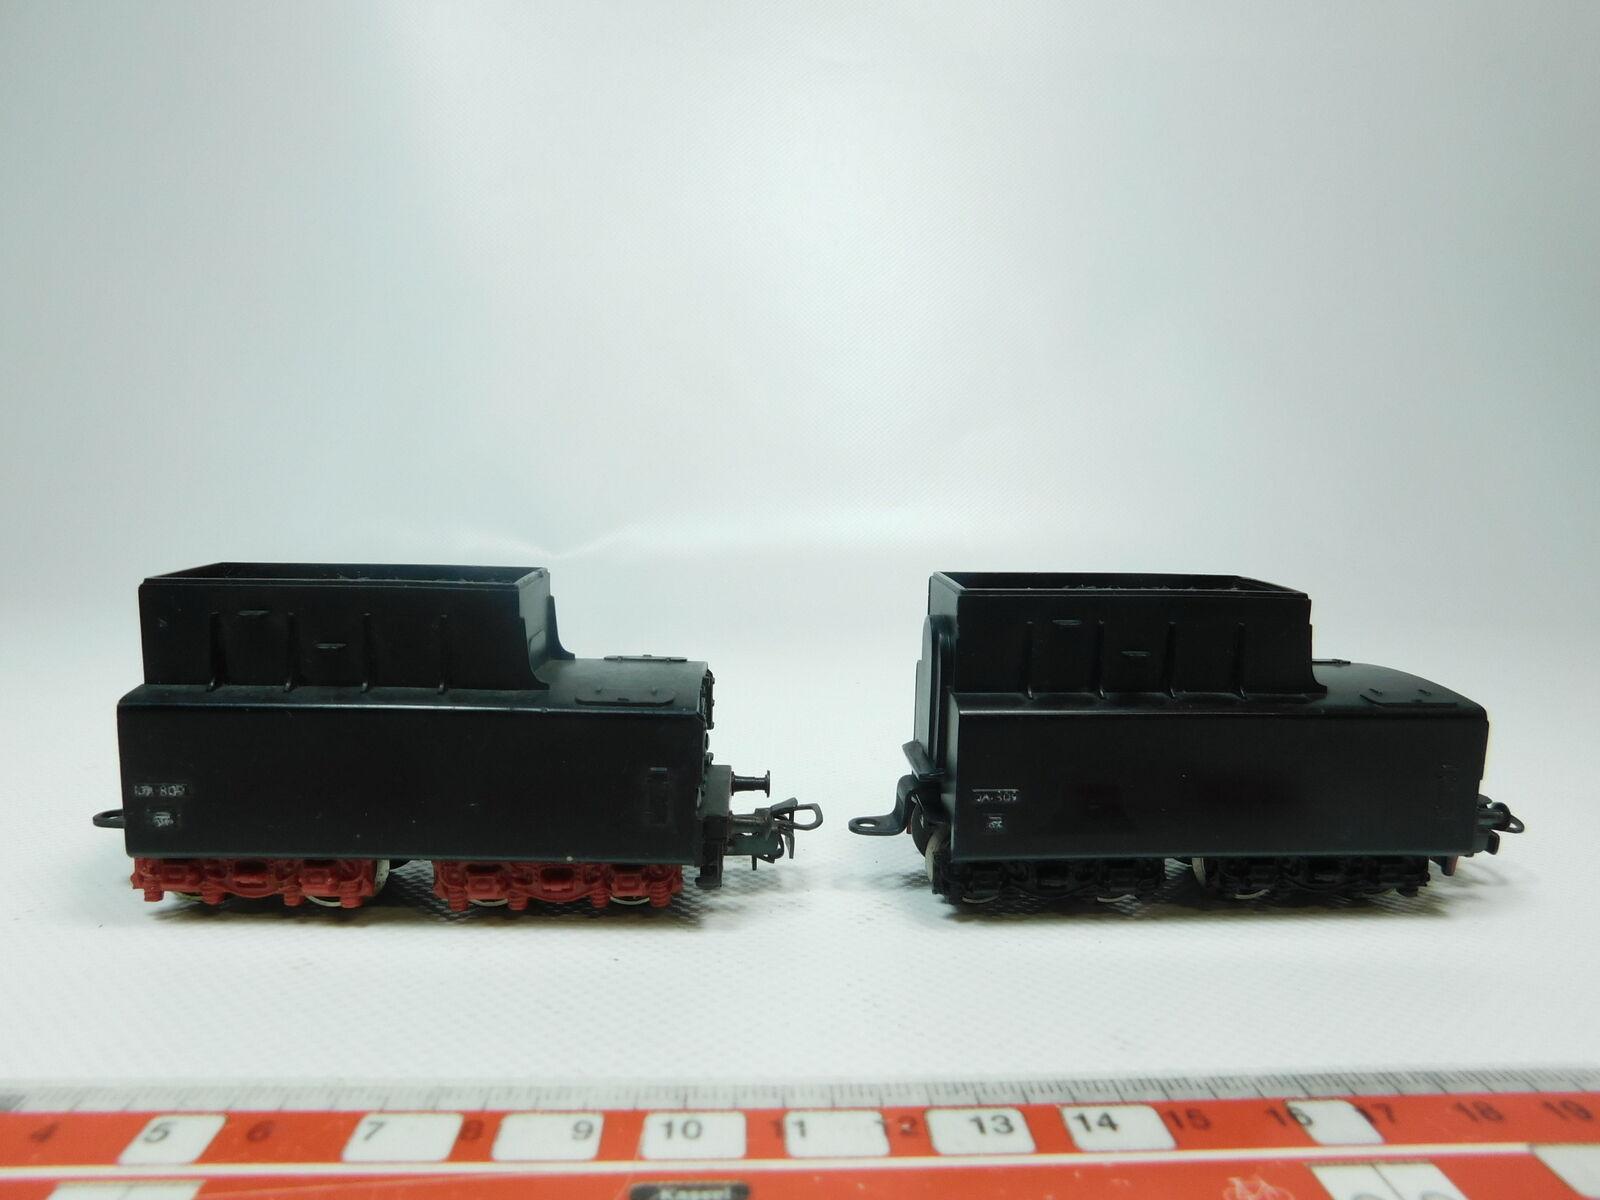 Bg417-0, 5 x MÄRKLIN H0 AC Tender DA 809 23 014 for Steam Locomotive DB,